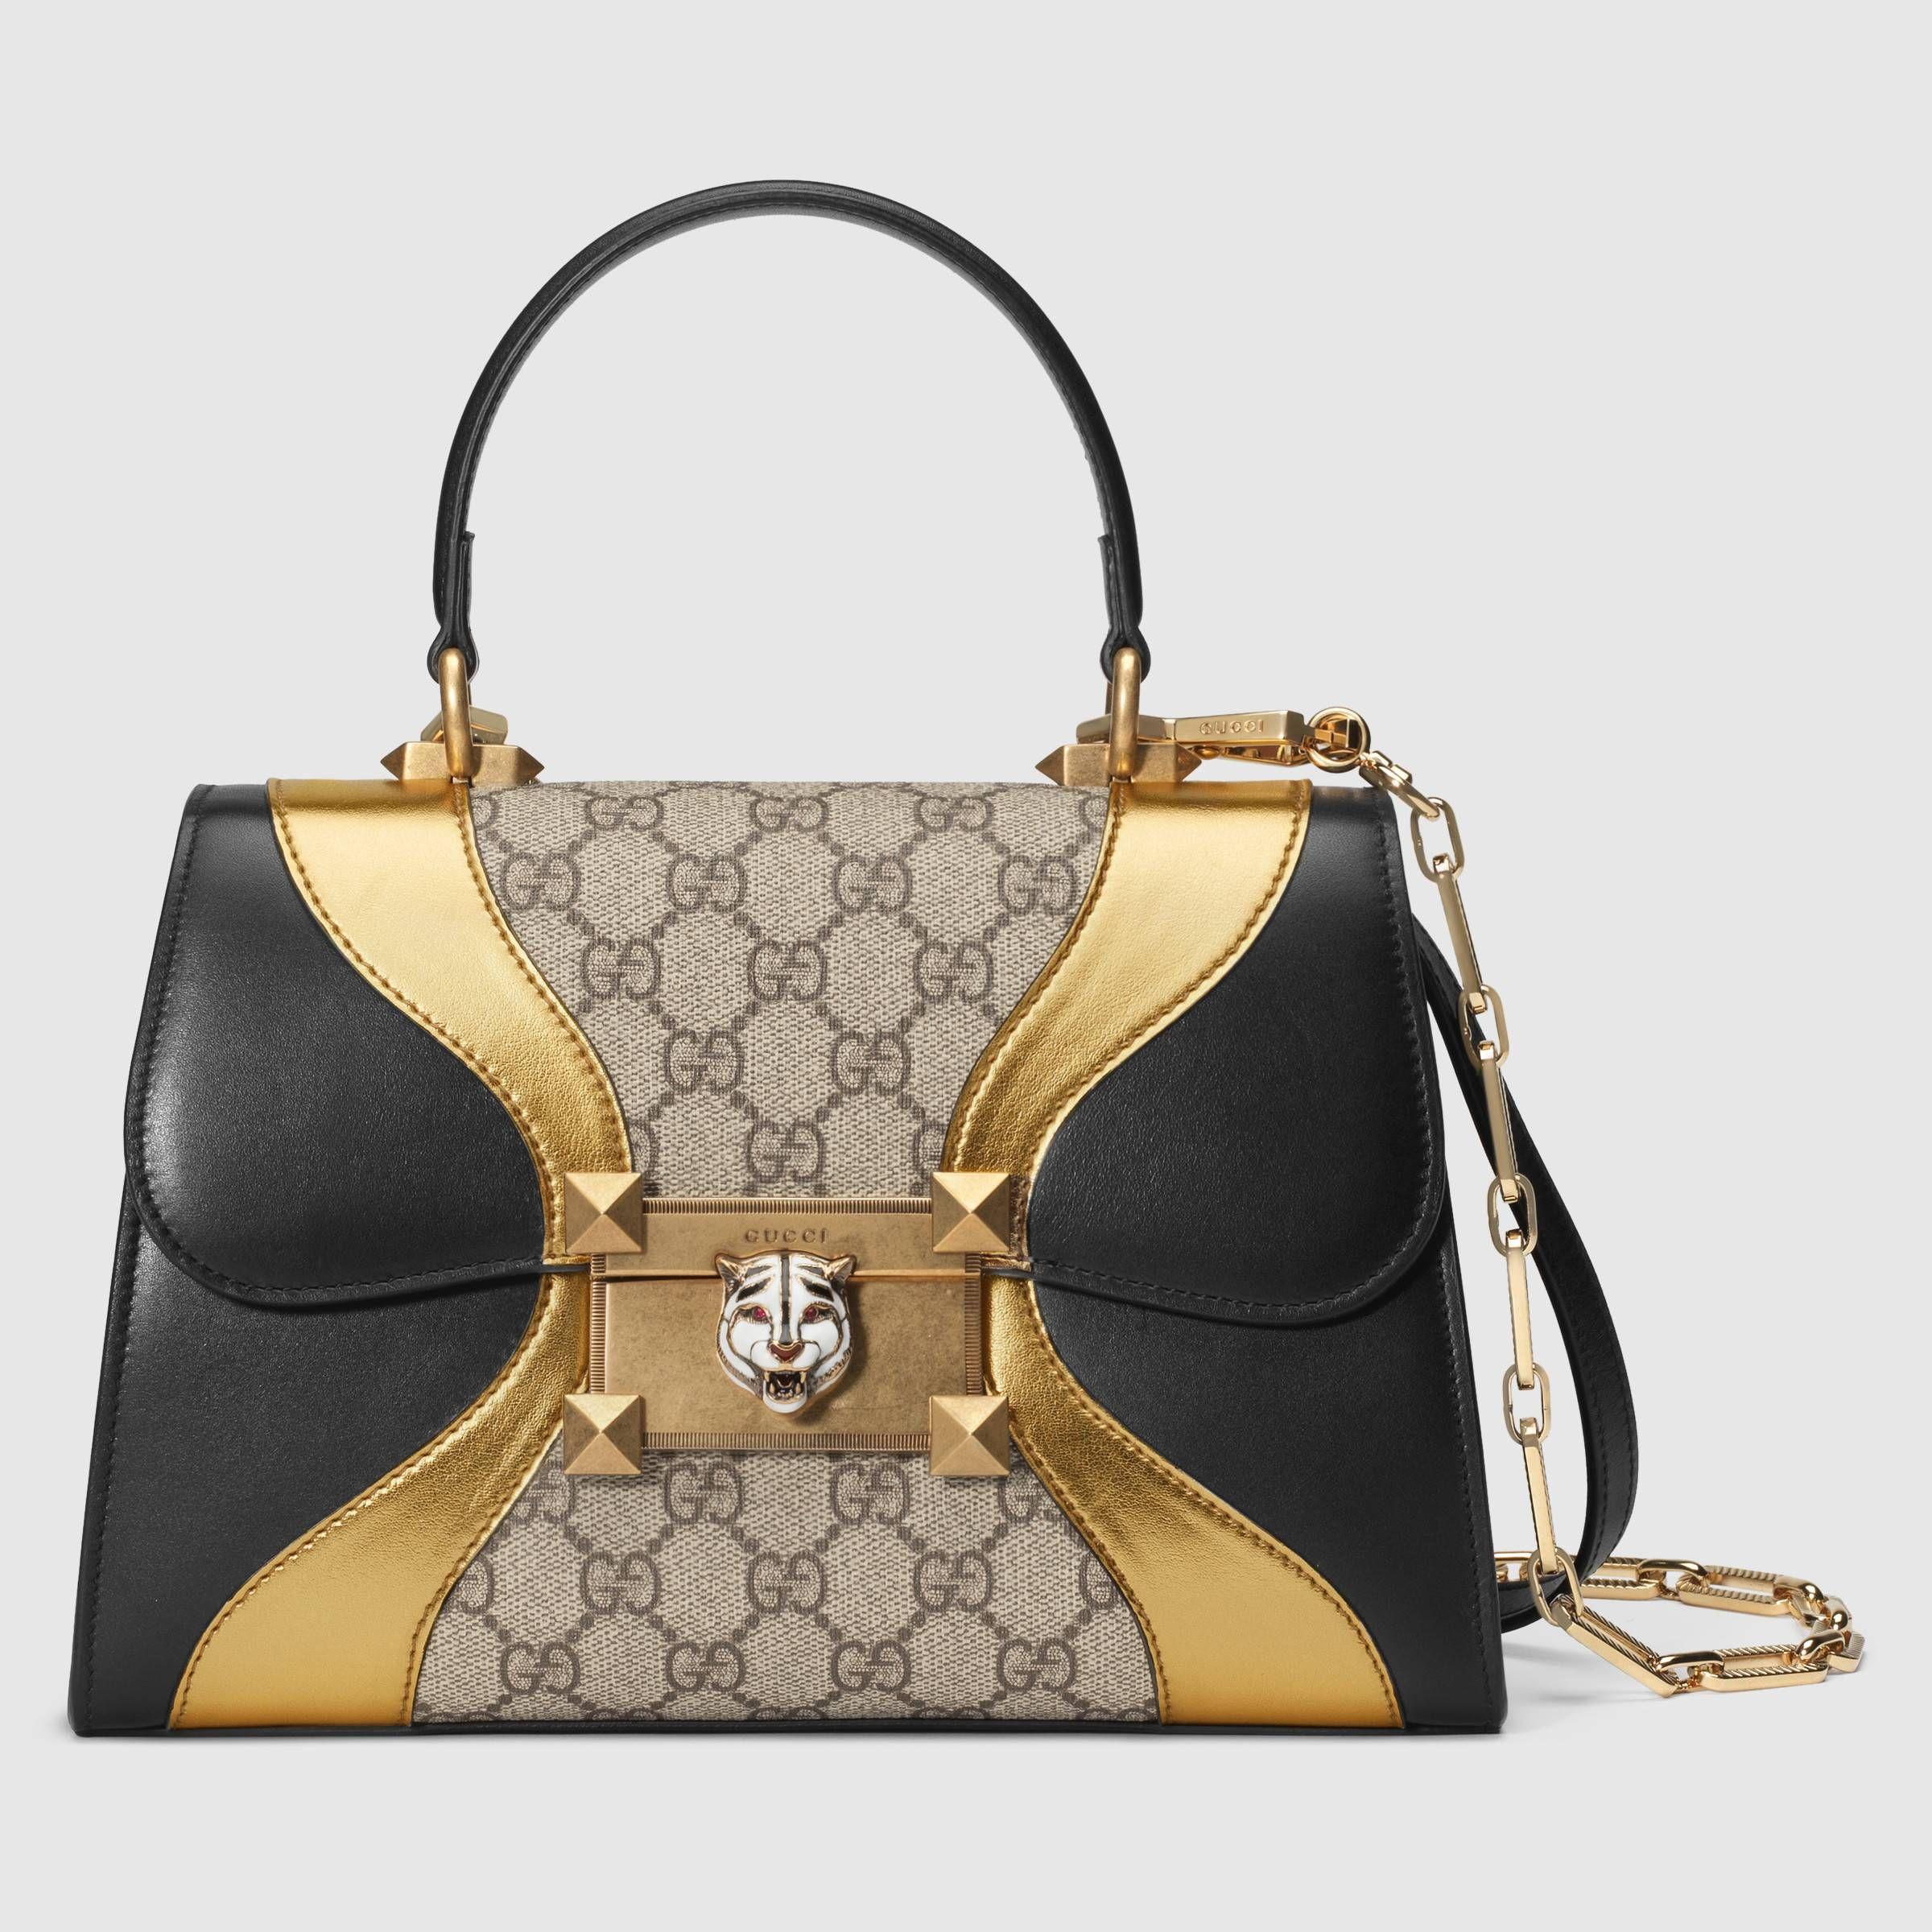 Osiride small GG top handle bag - Gucci Women's Top Handles & Boston Bags  497996DVUZX8754   Women handbags, Bags, Fashion bags